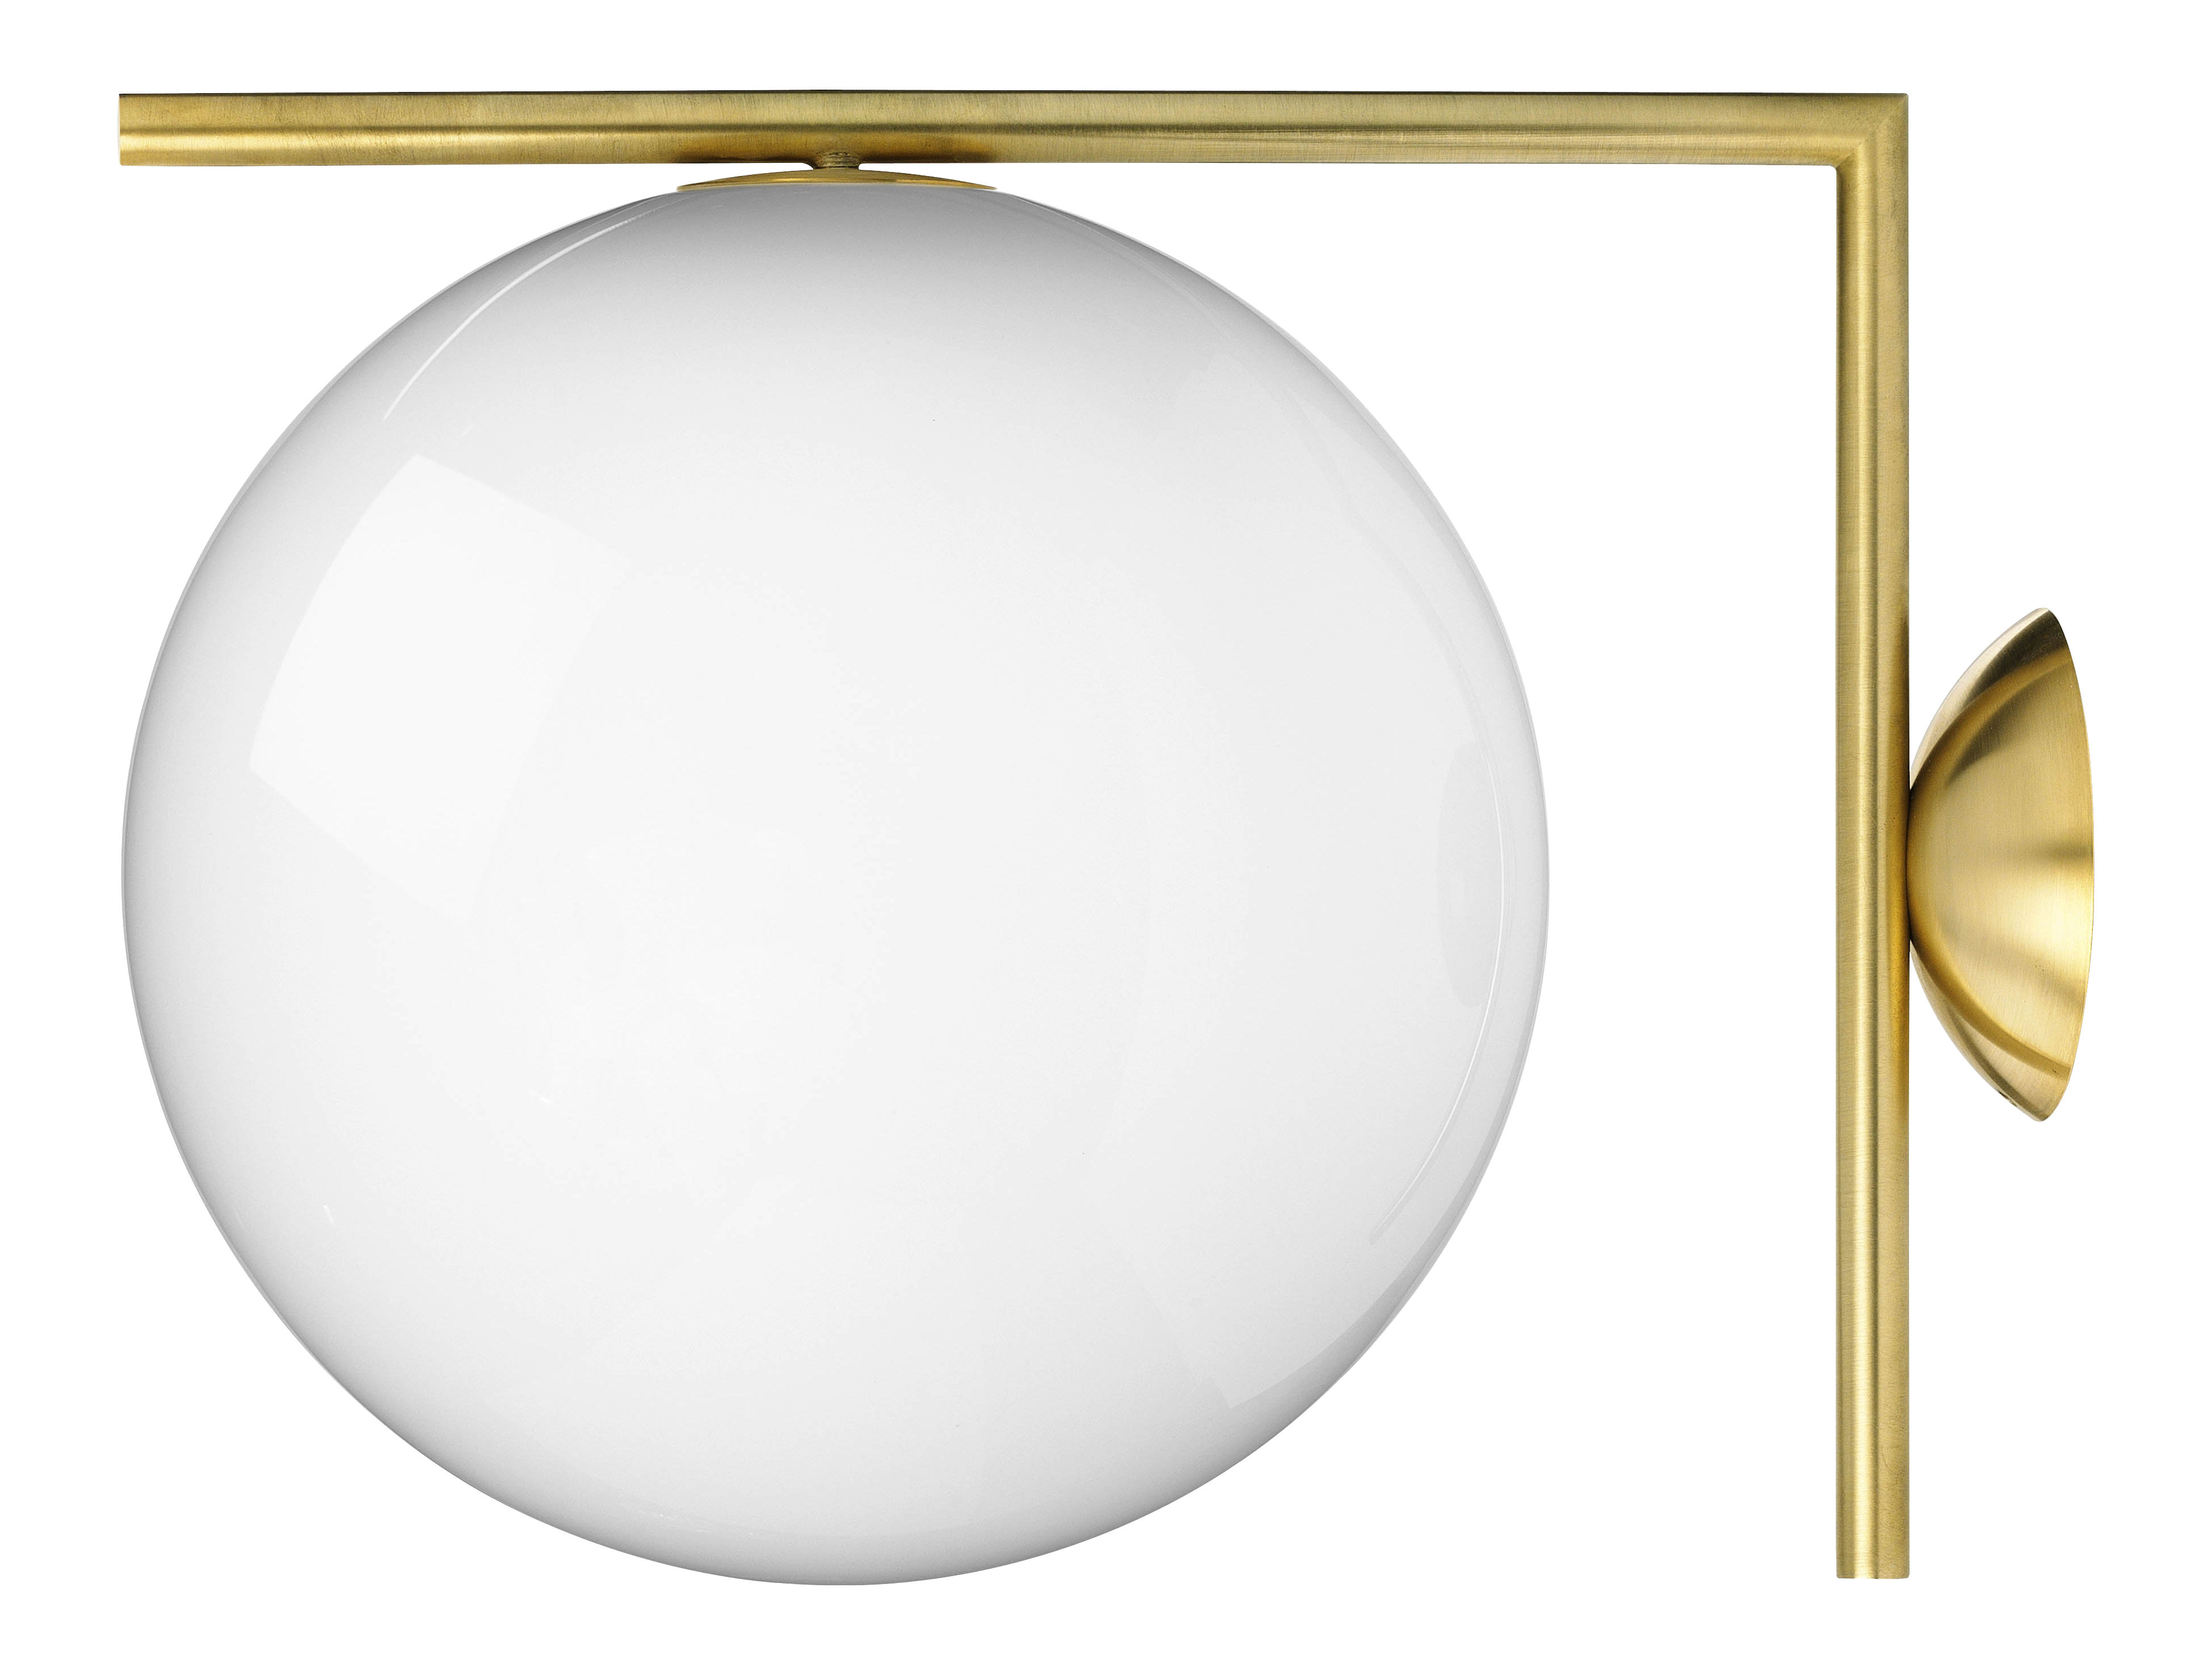 Lighting - Wall Lights - IC W2 Wall light by Flos - Brass - Blown glass, Steel